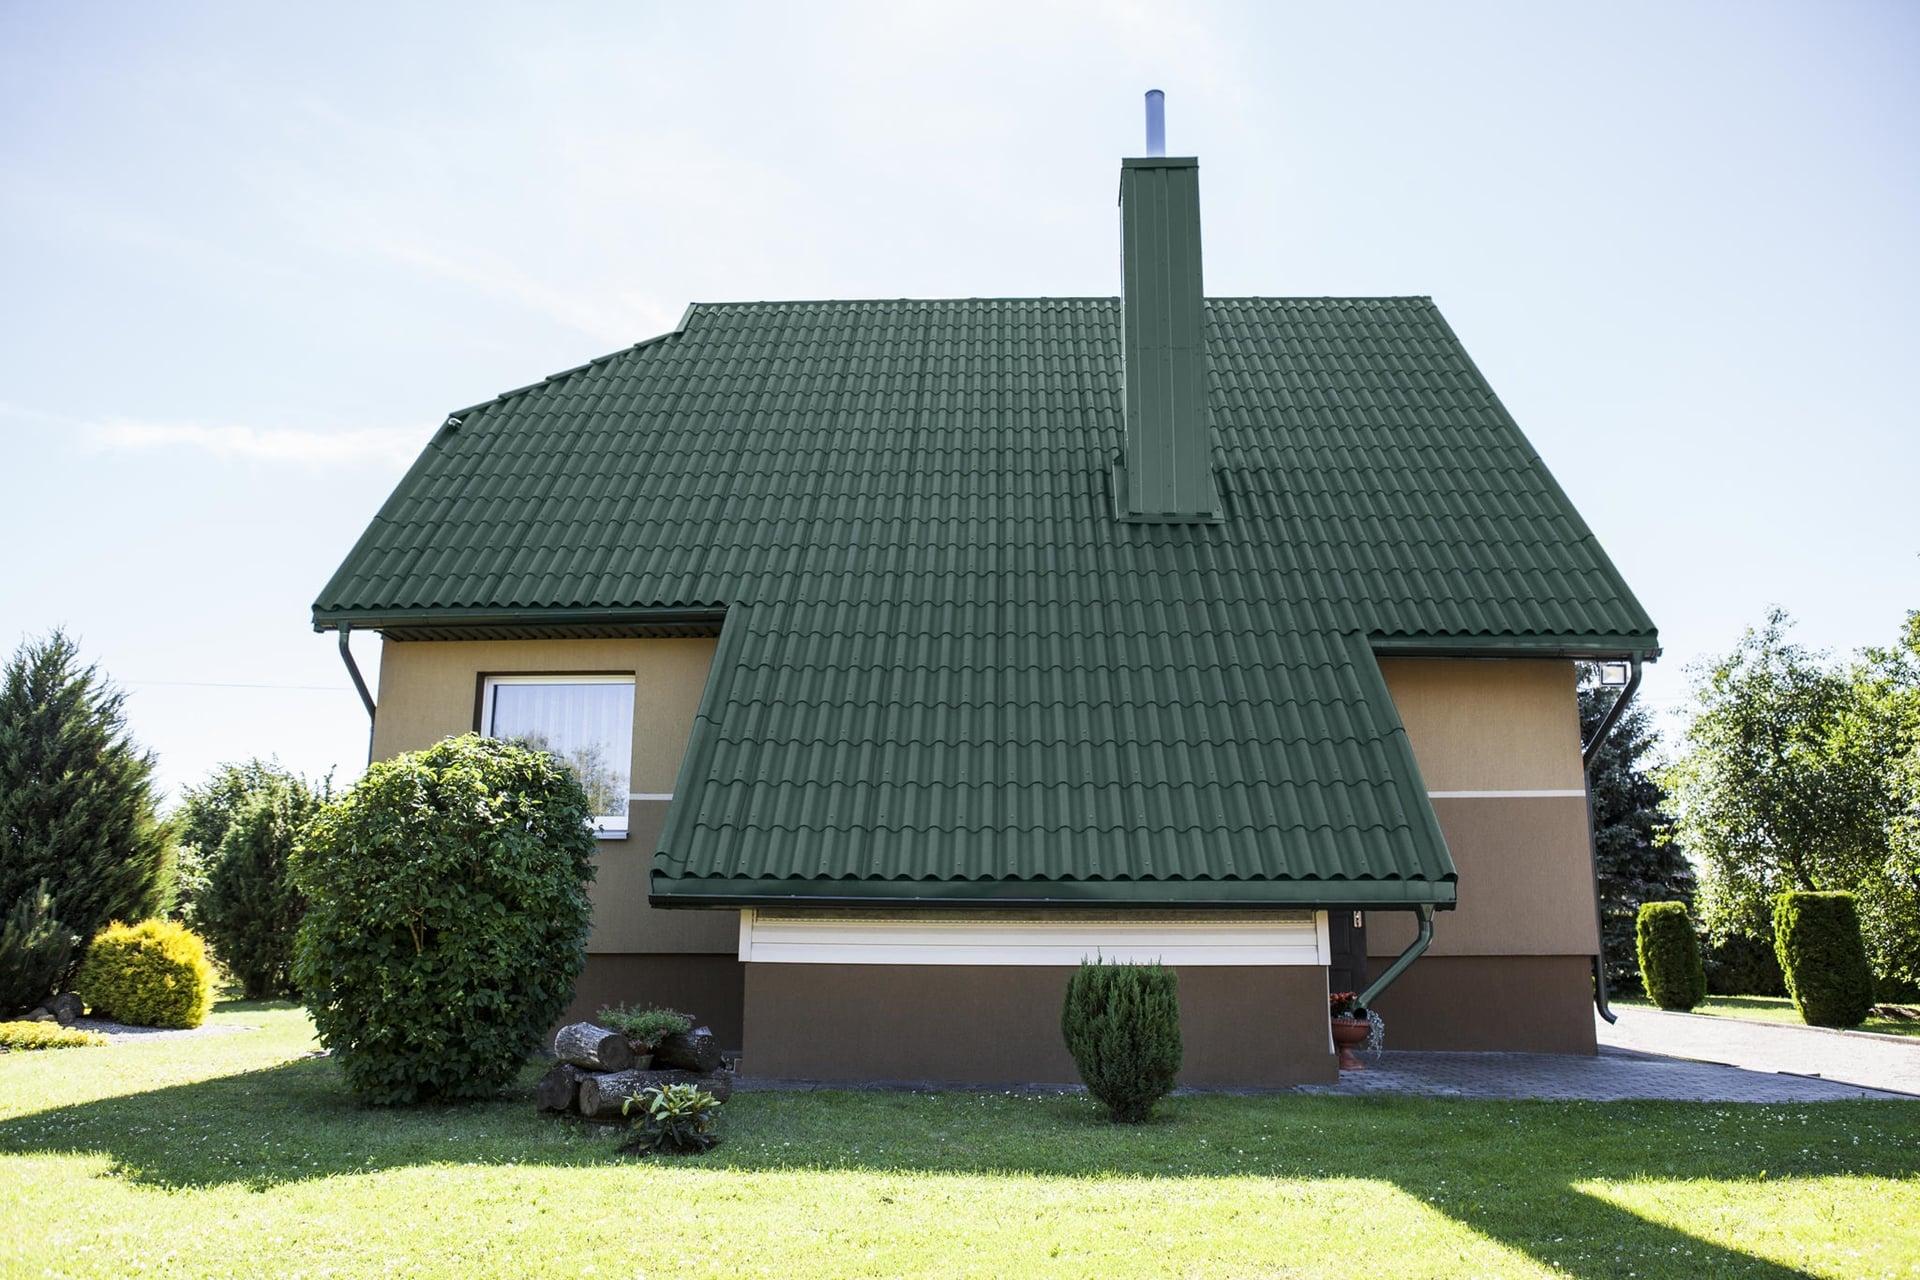 Eterniidi muuk, eterniitkatus, eterniit katus, merbest, eterniit katus